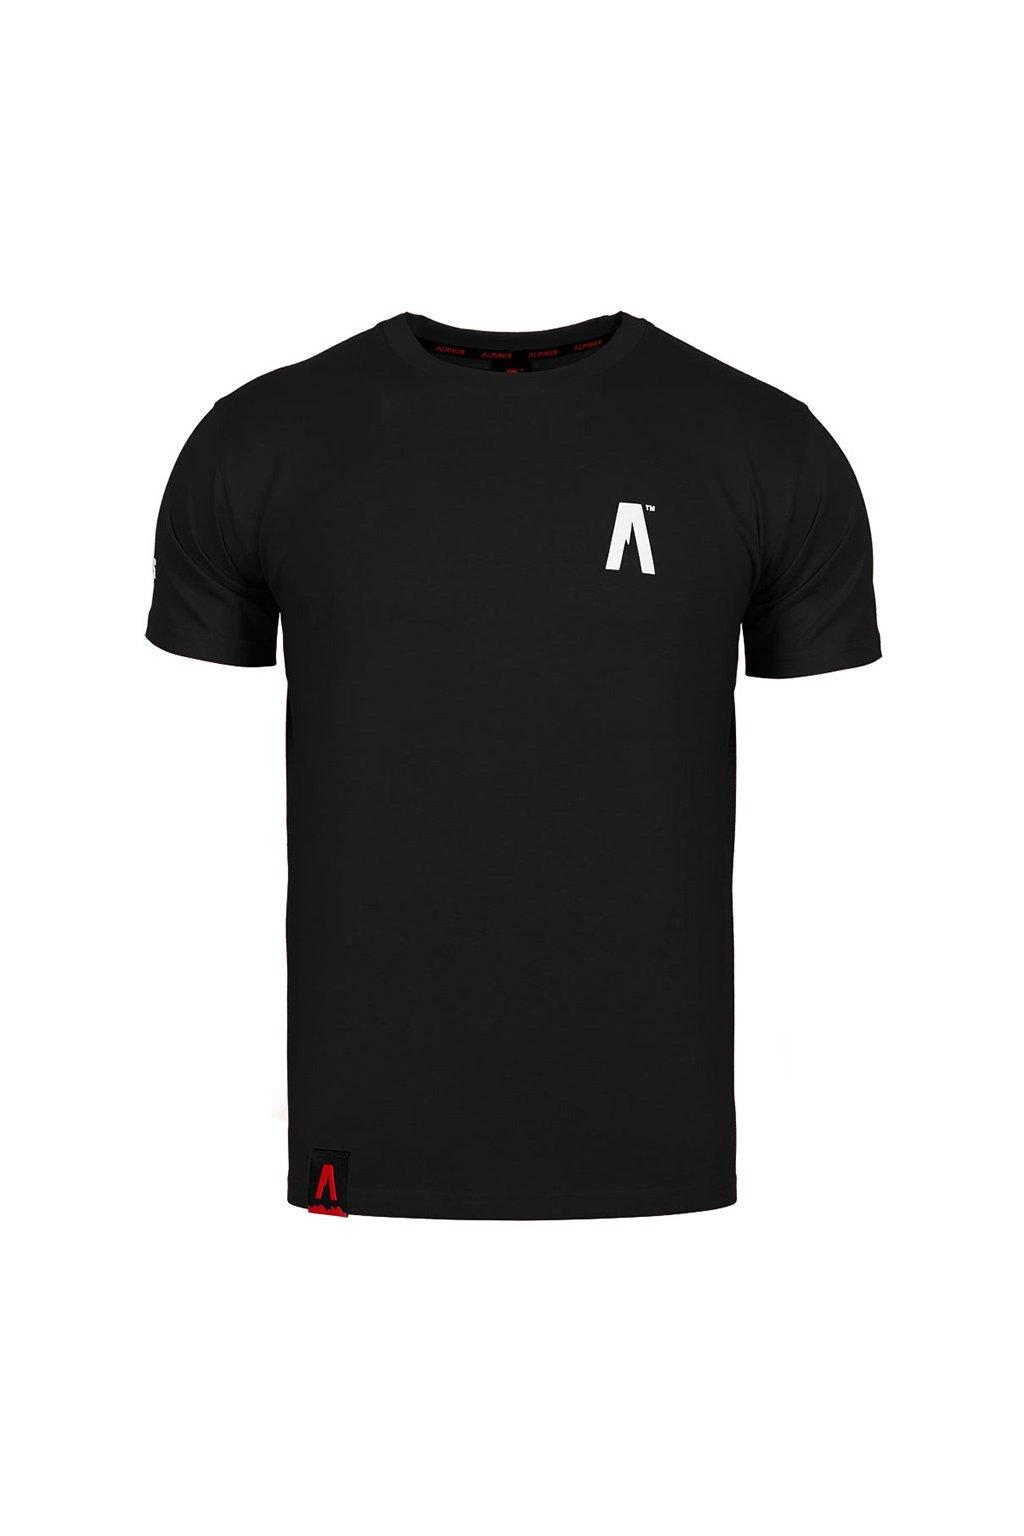 Pánske tričko Alpinus A' čierne ALP20TC0002_ADD